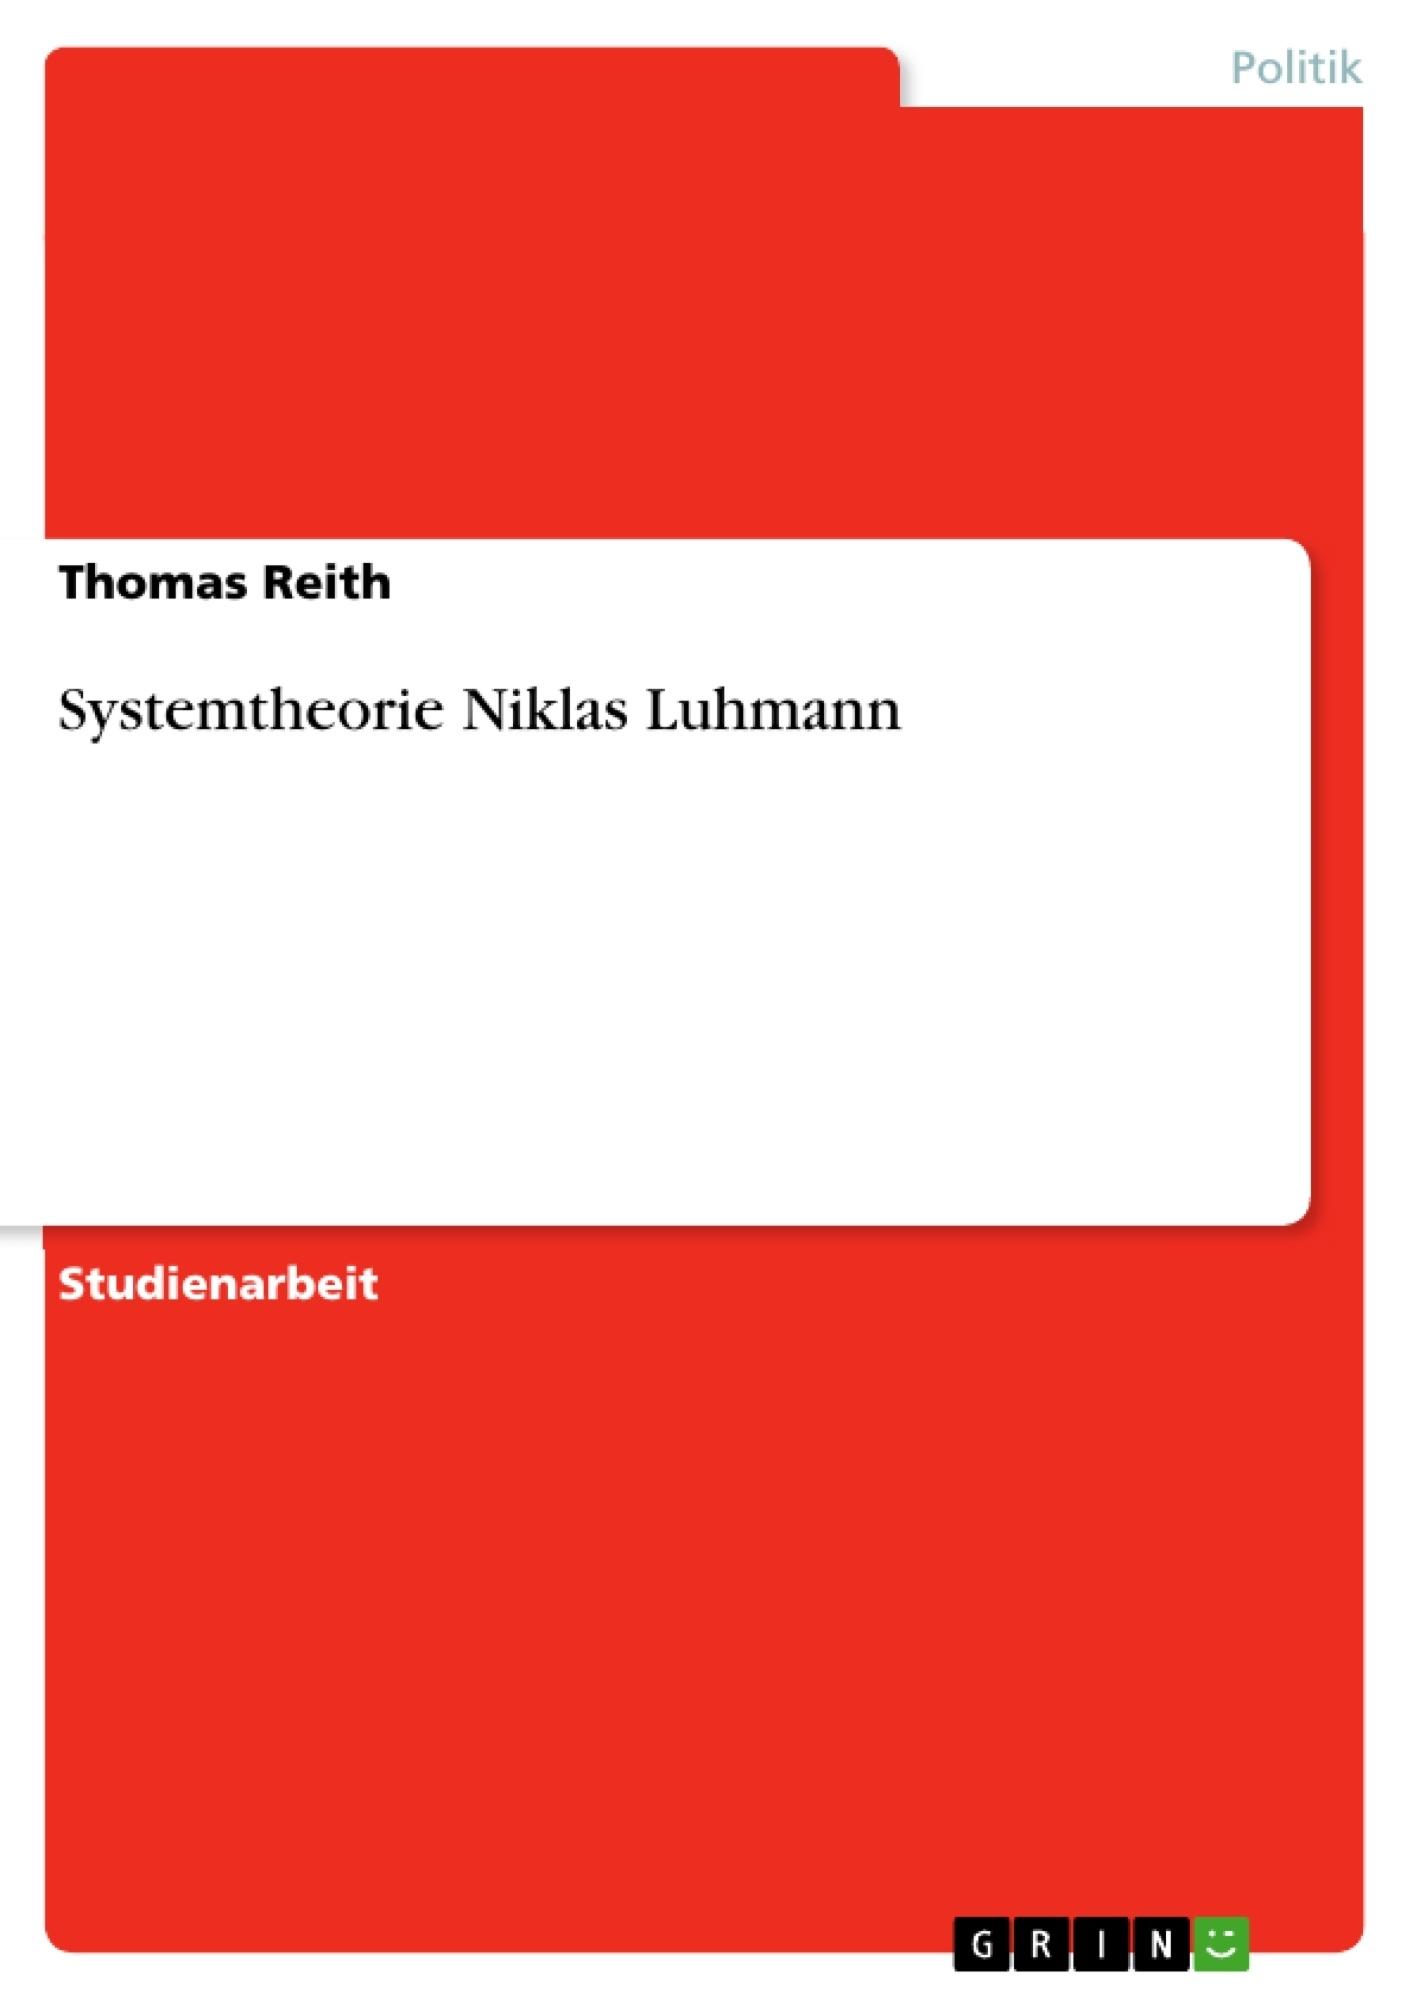 Titel: Systemtheorie Niklas Luhmann